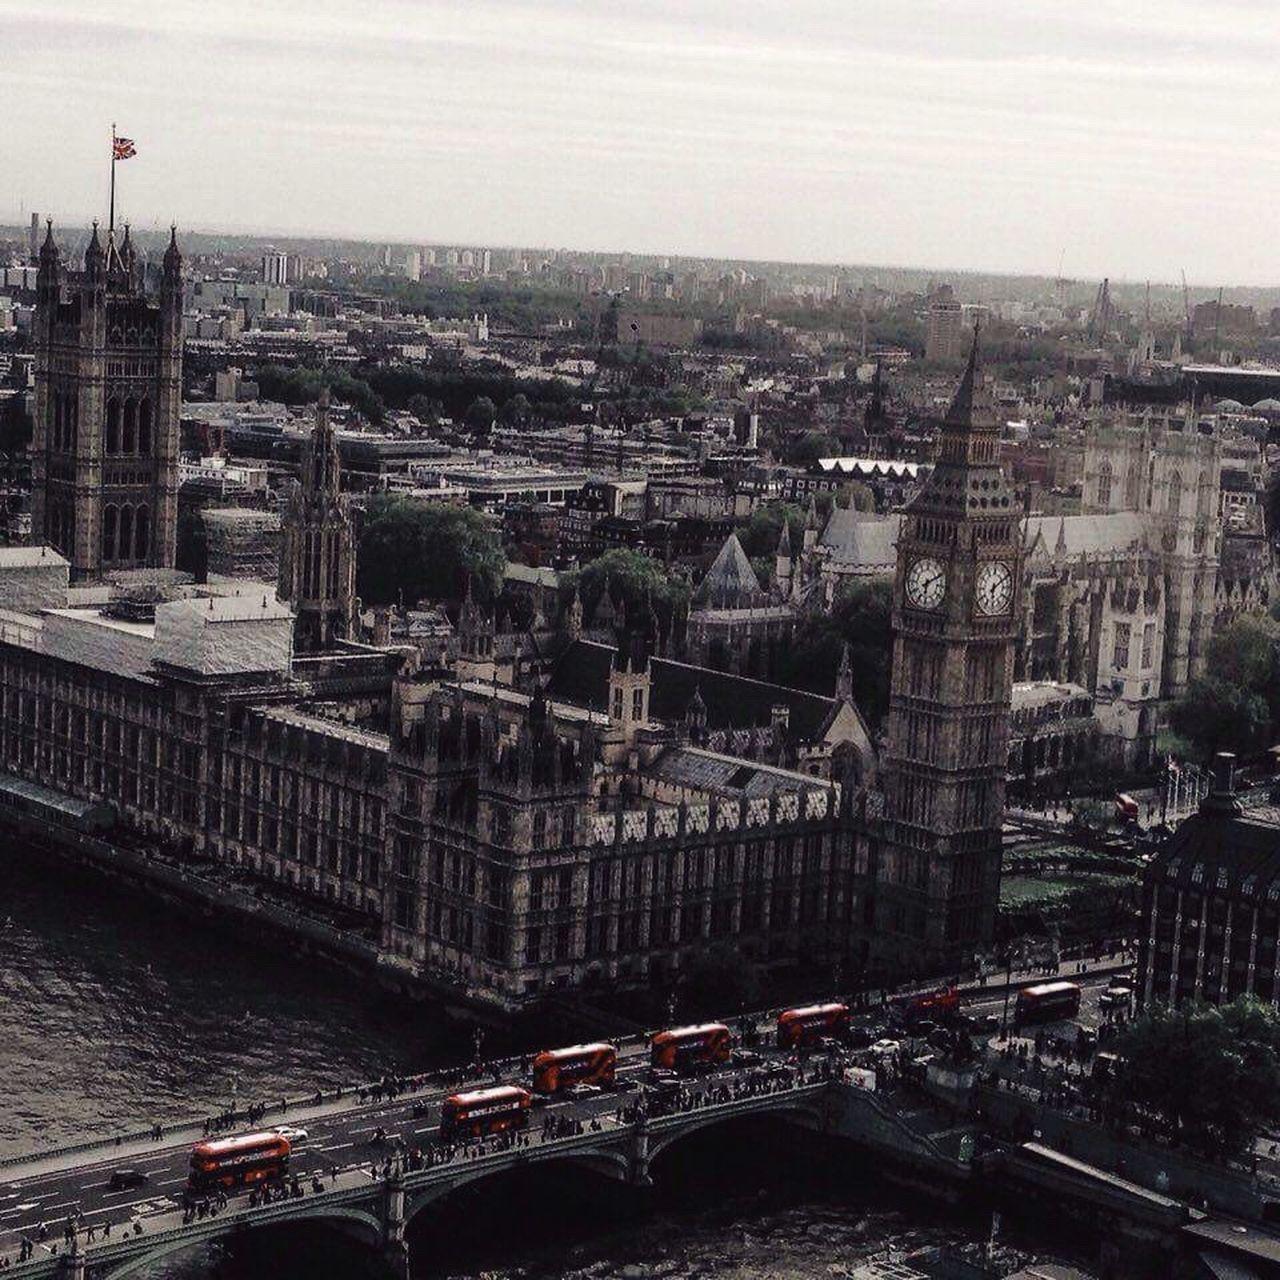 London Big Ben Redbuses Beautiful Amazing View Amazing Architecture Truestory Peaceandlove♥ London Eye London Lifestyle